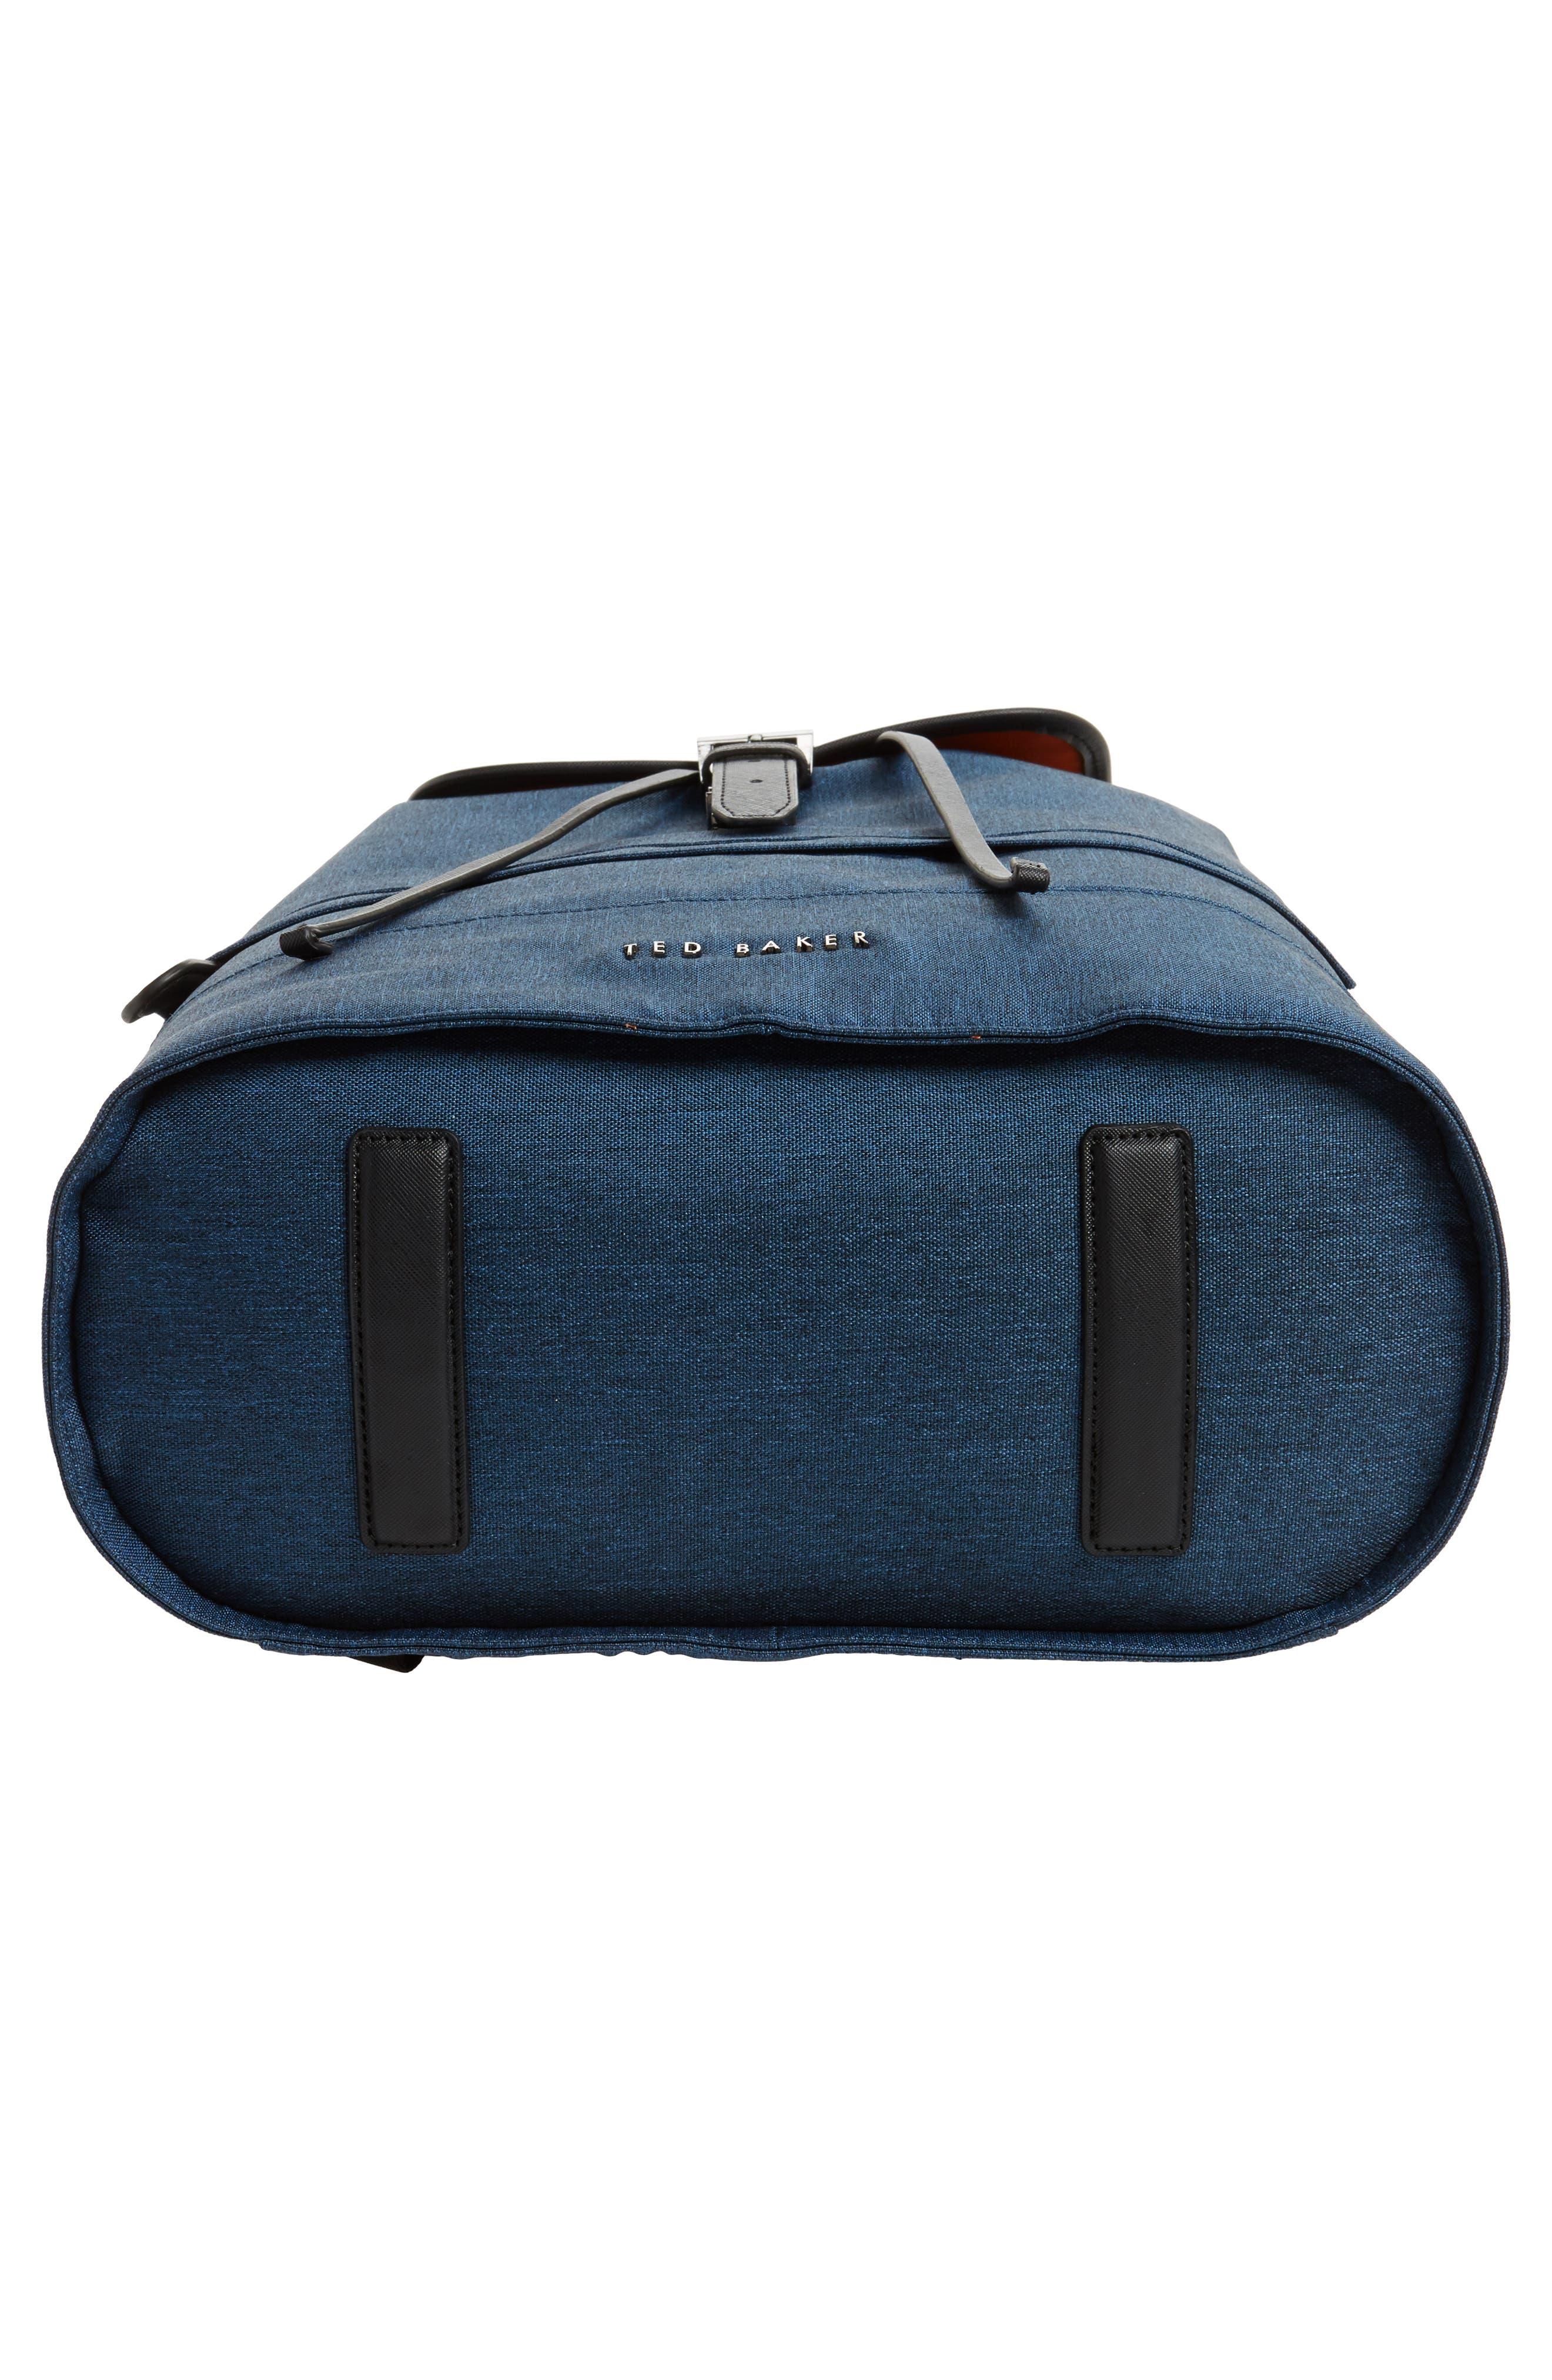 Rayman Backpack,                             Alternate thumbnail 6, color,                             Blue